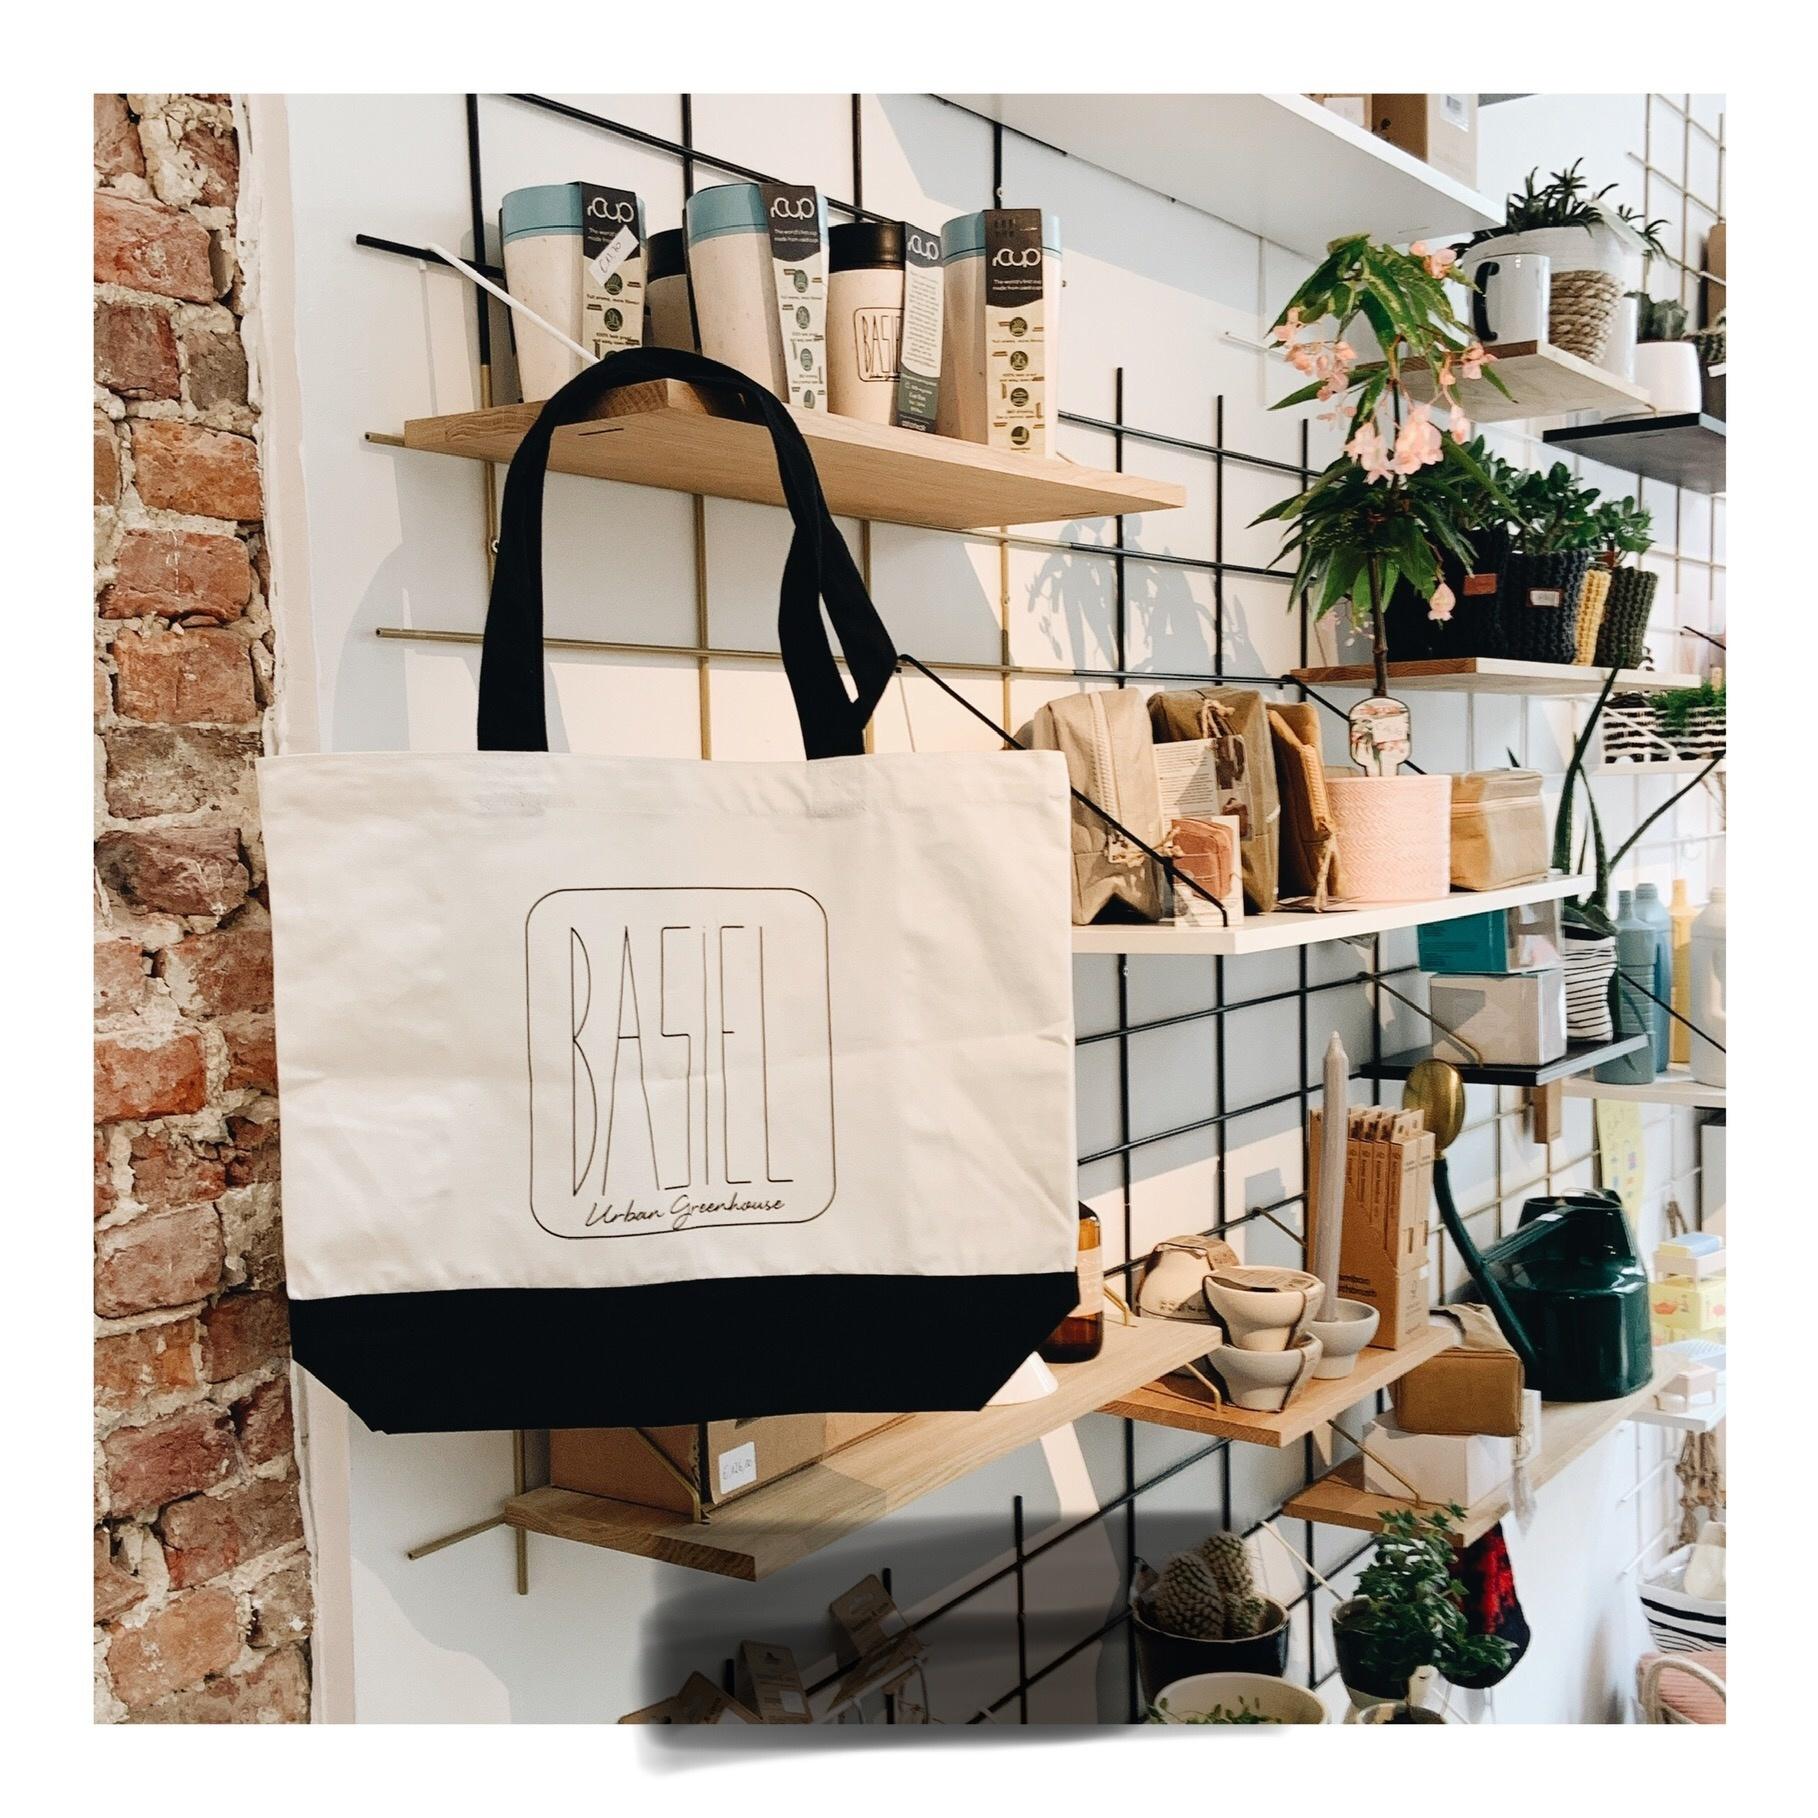 (D)eco Store